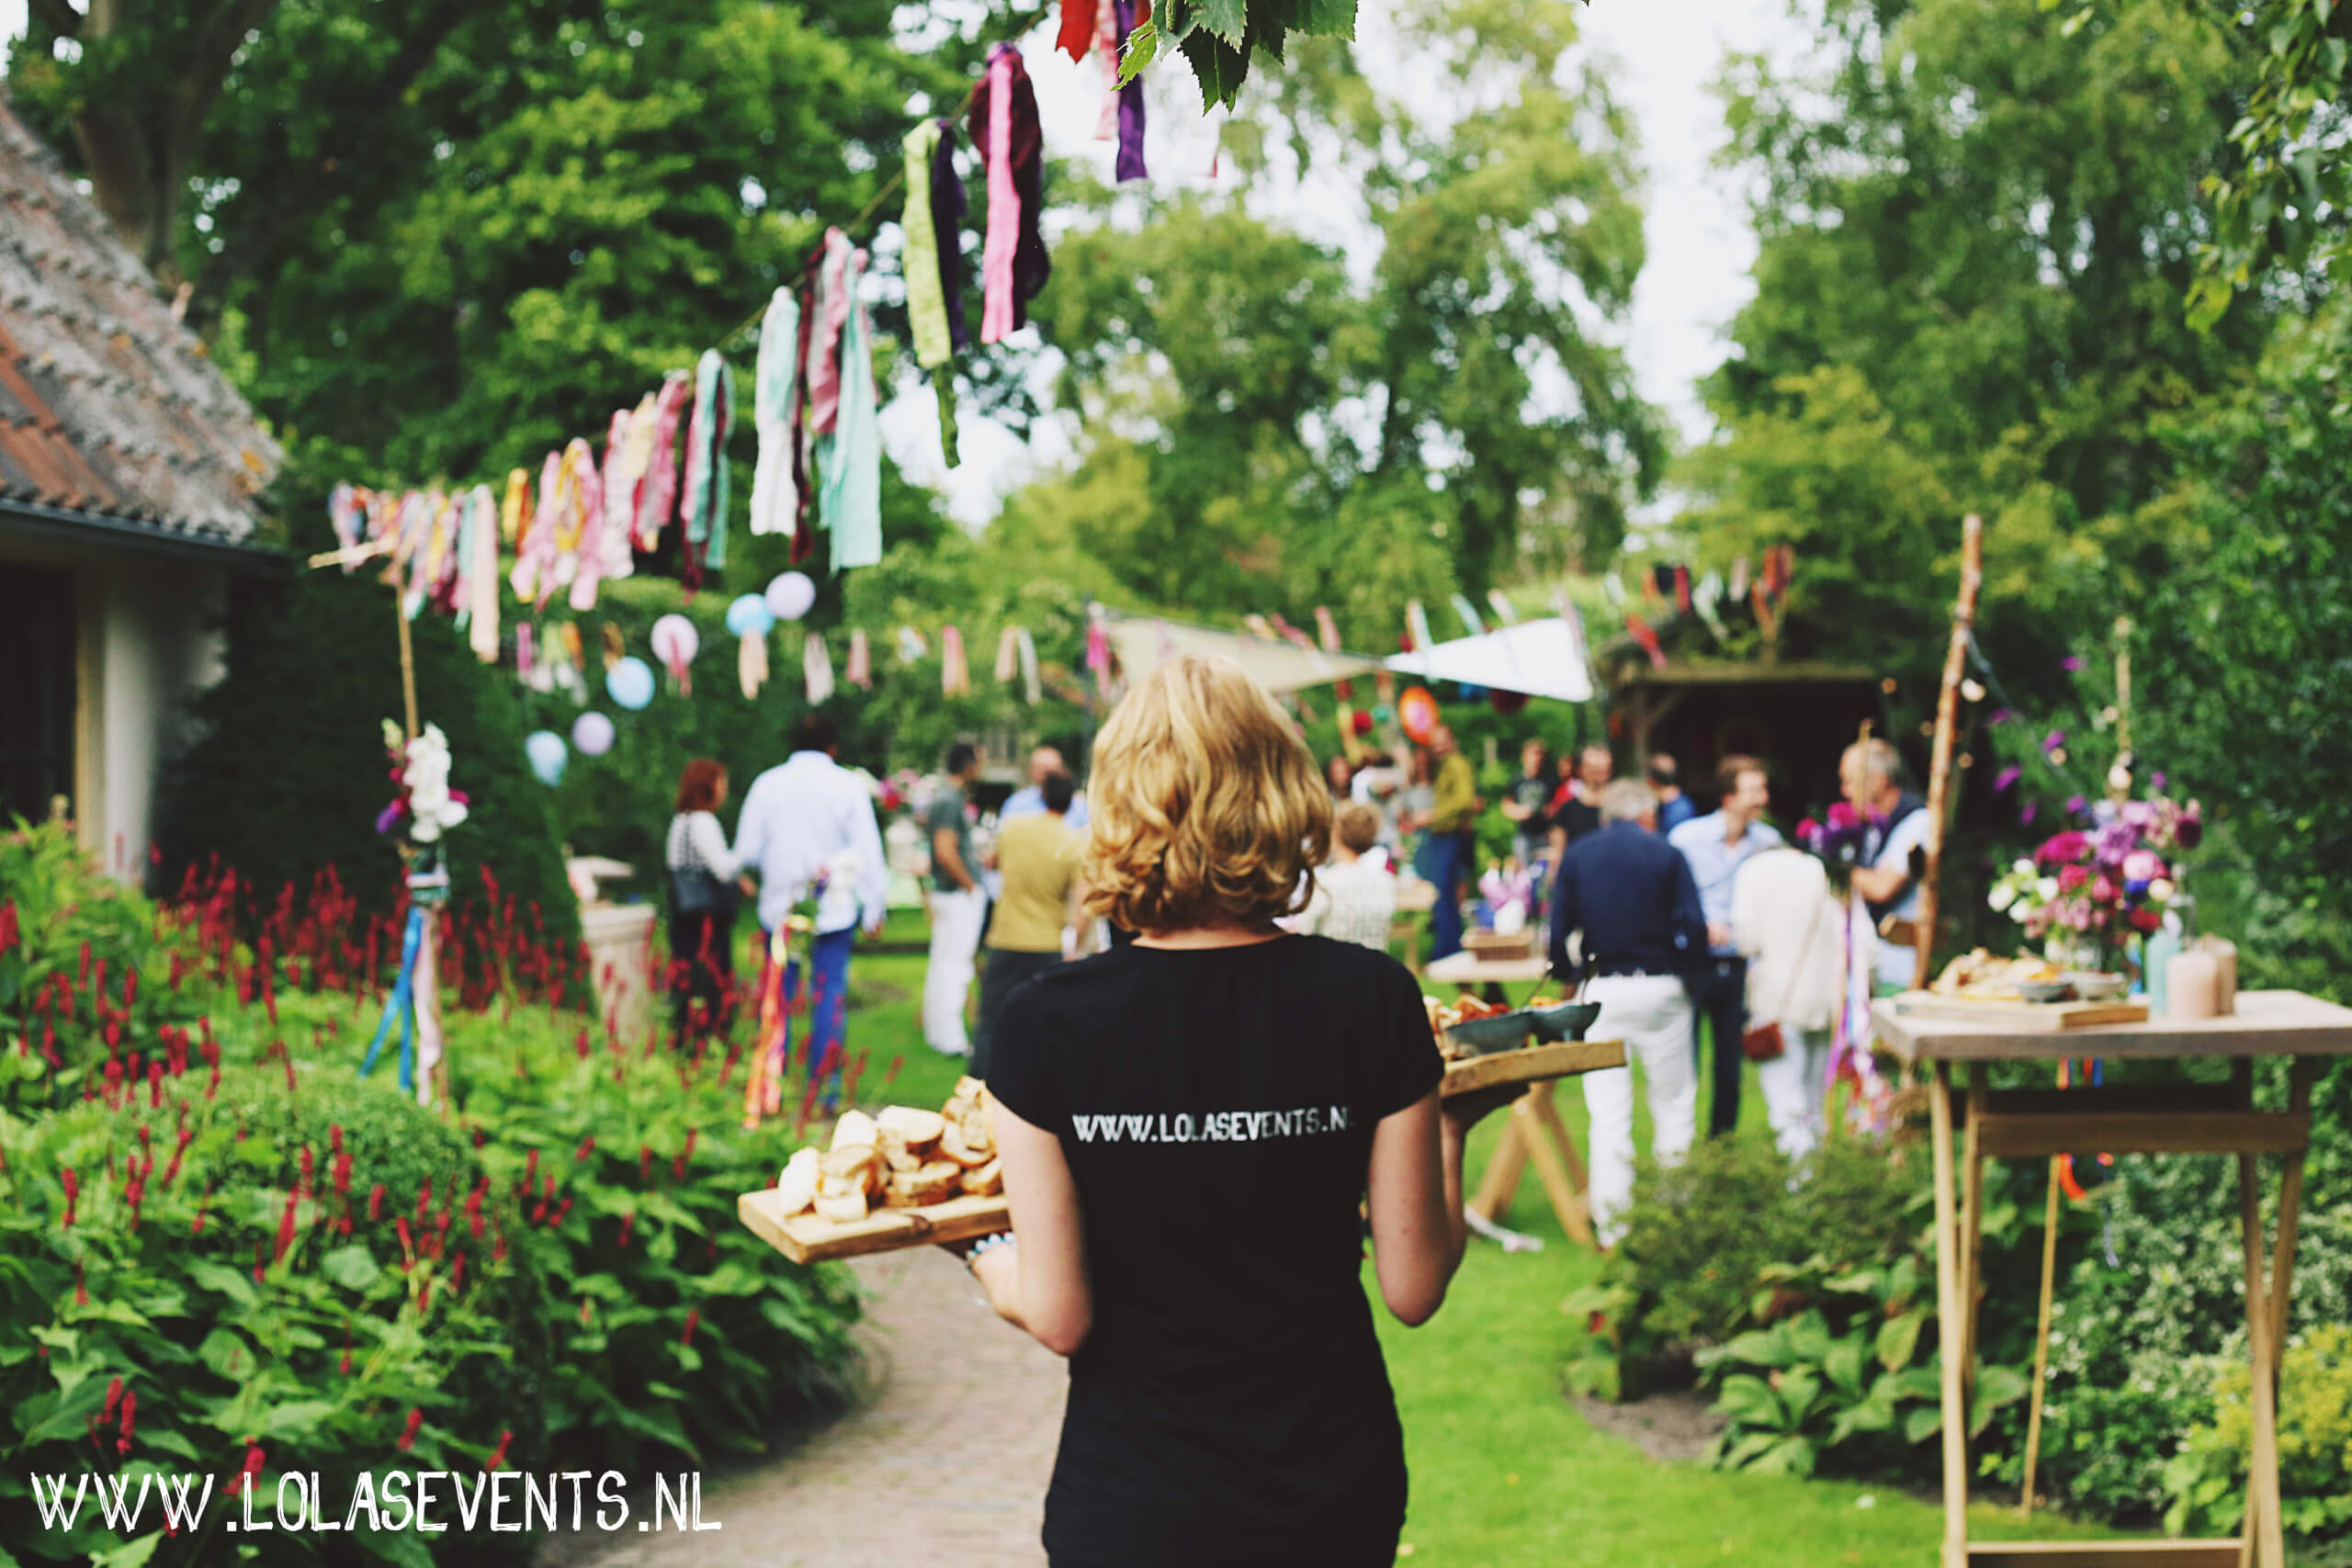 www.lolasevents.nl